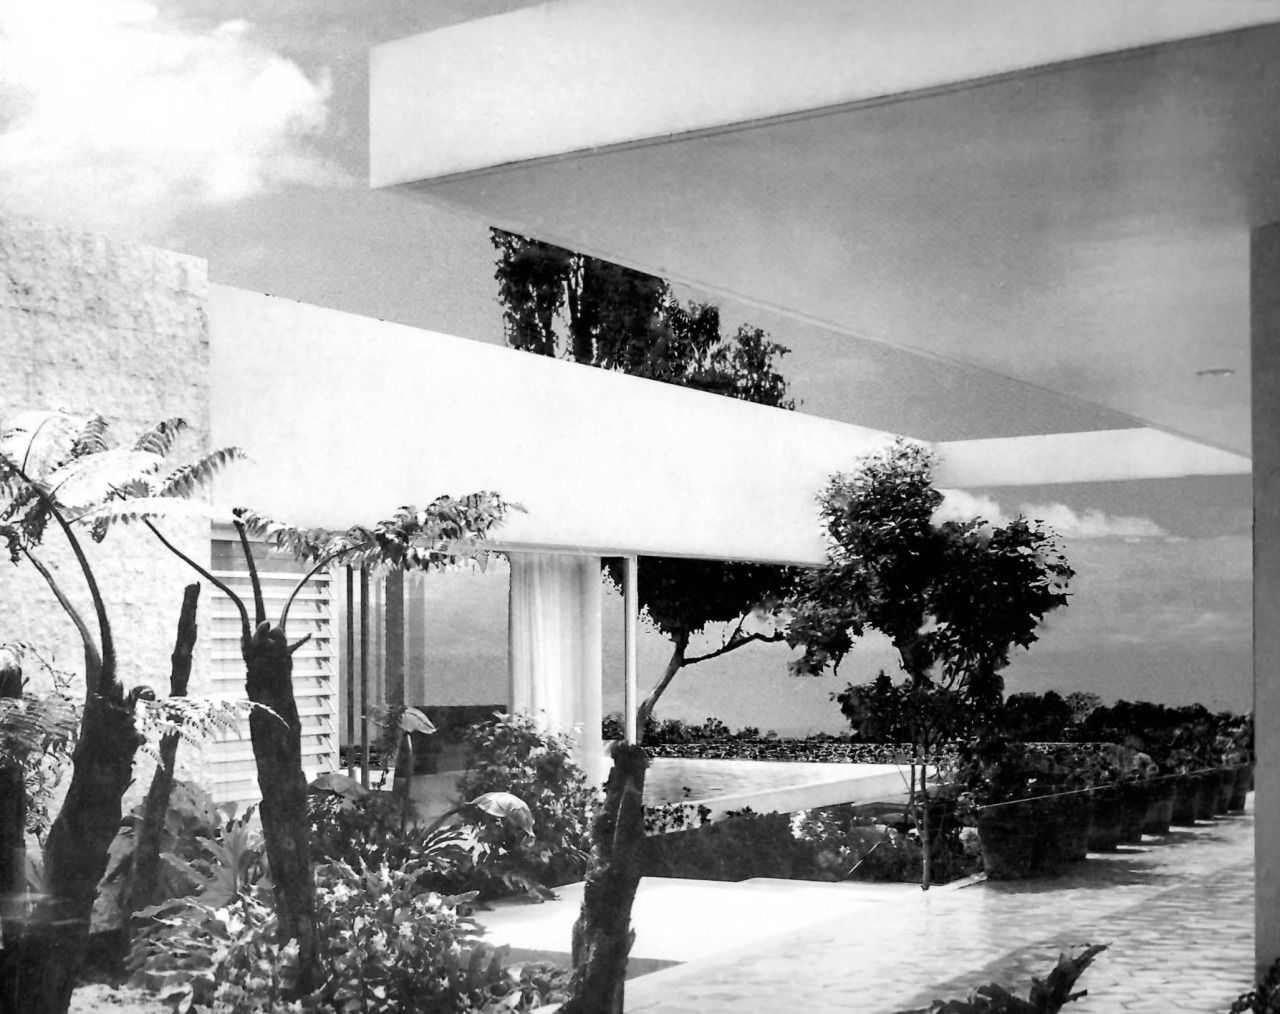 Casa perezcano calle del agua 383 jardines del pedregal for 777 jardines del pedregal